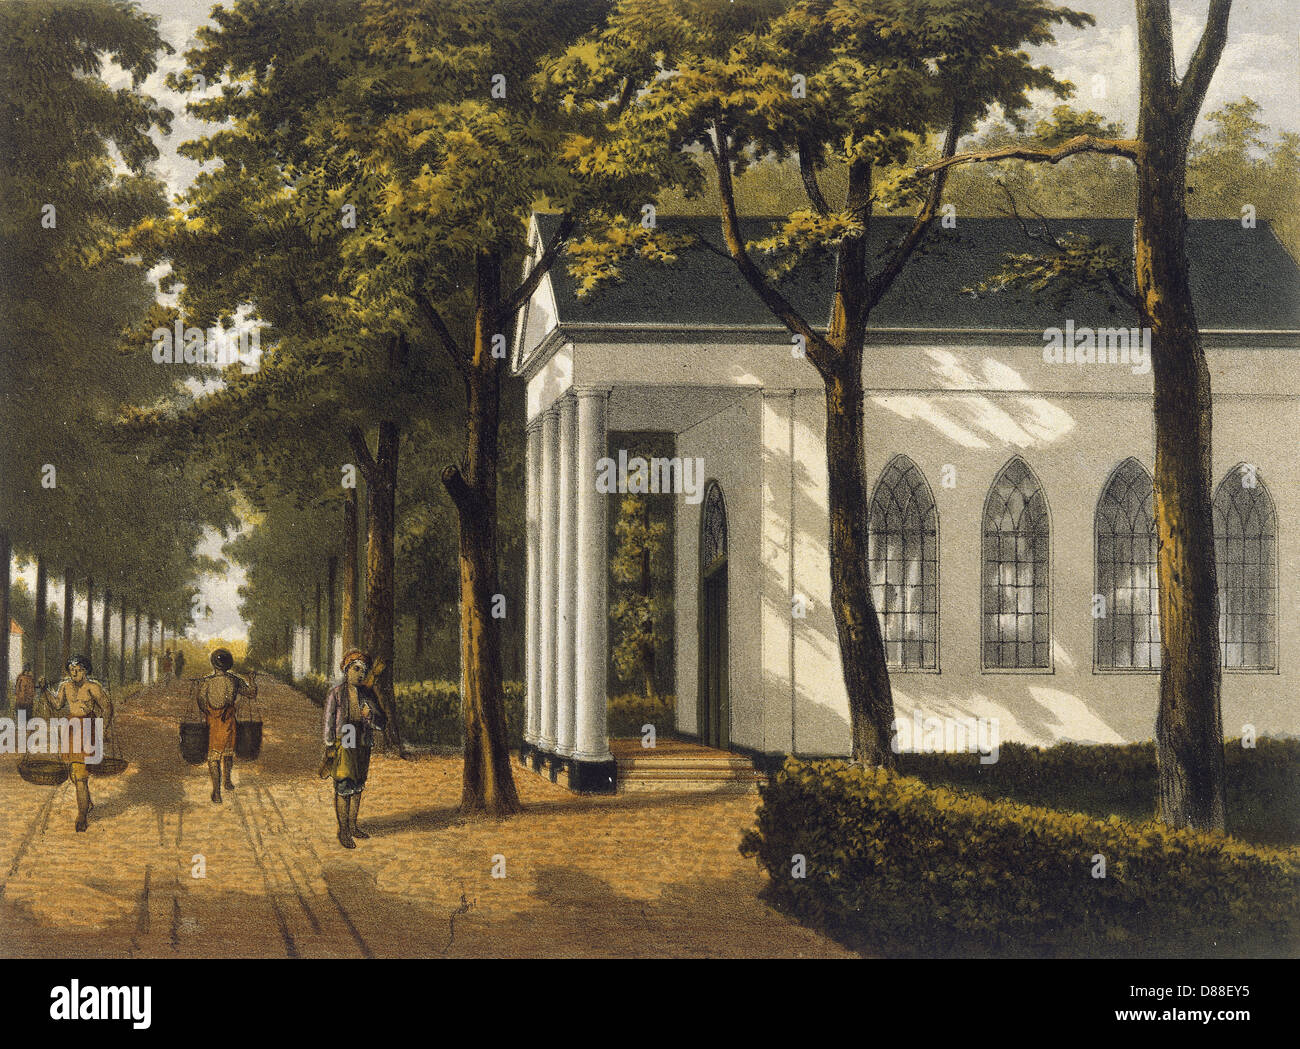 Java Djakarta 1882 - Stock Image